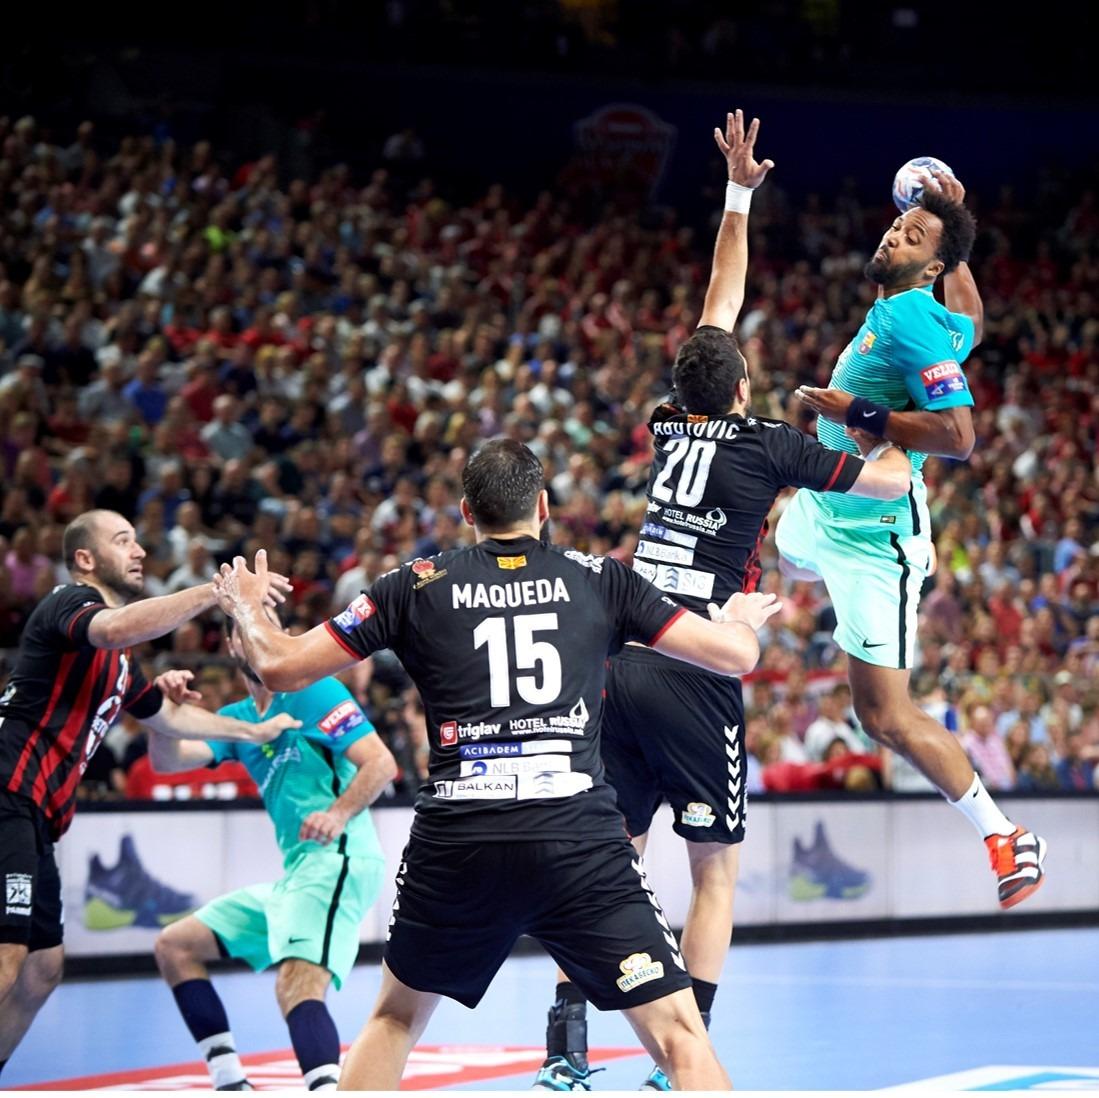 HandballQUADRATISCH